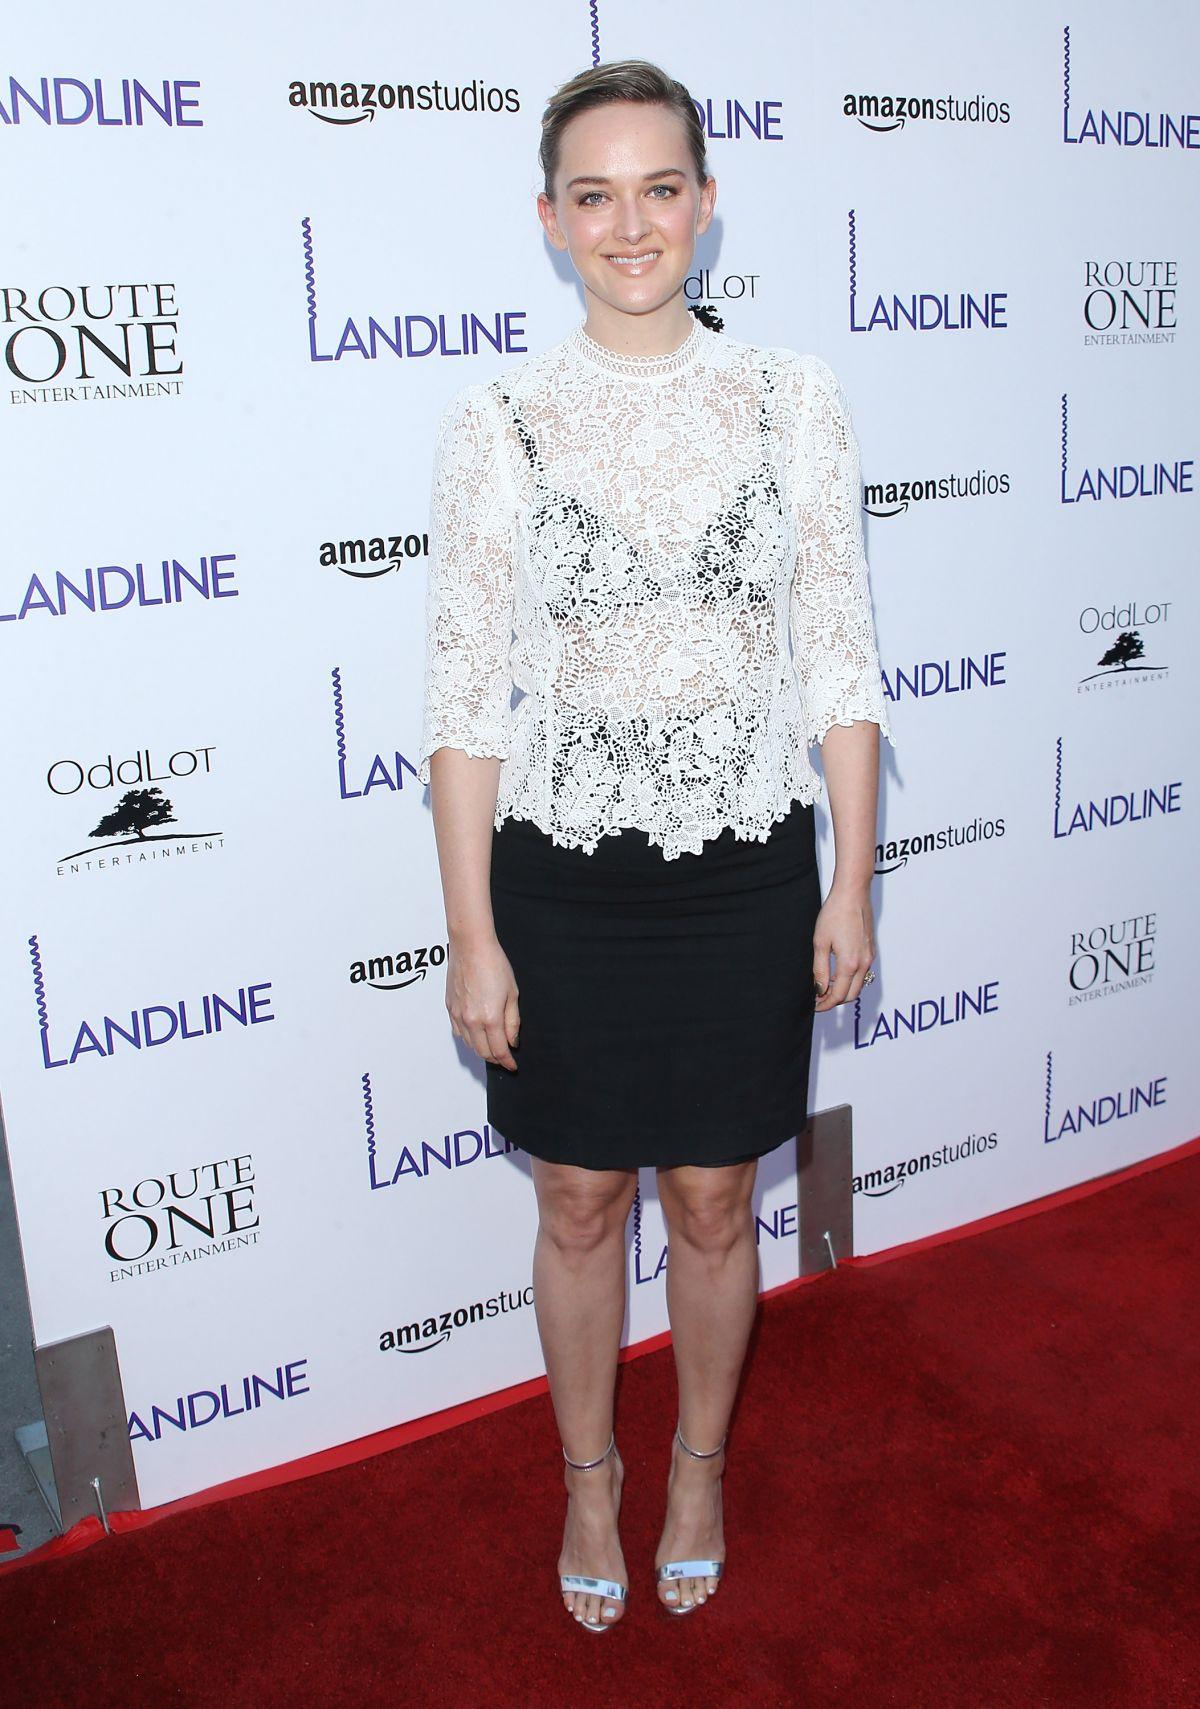 JESS WEIXLER at Landline Premiere in Hollywood 07/12/2017